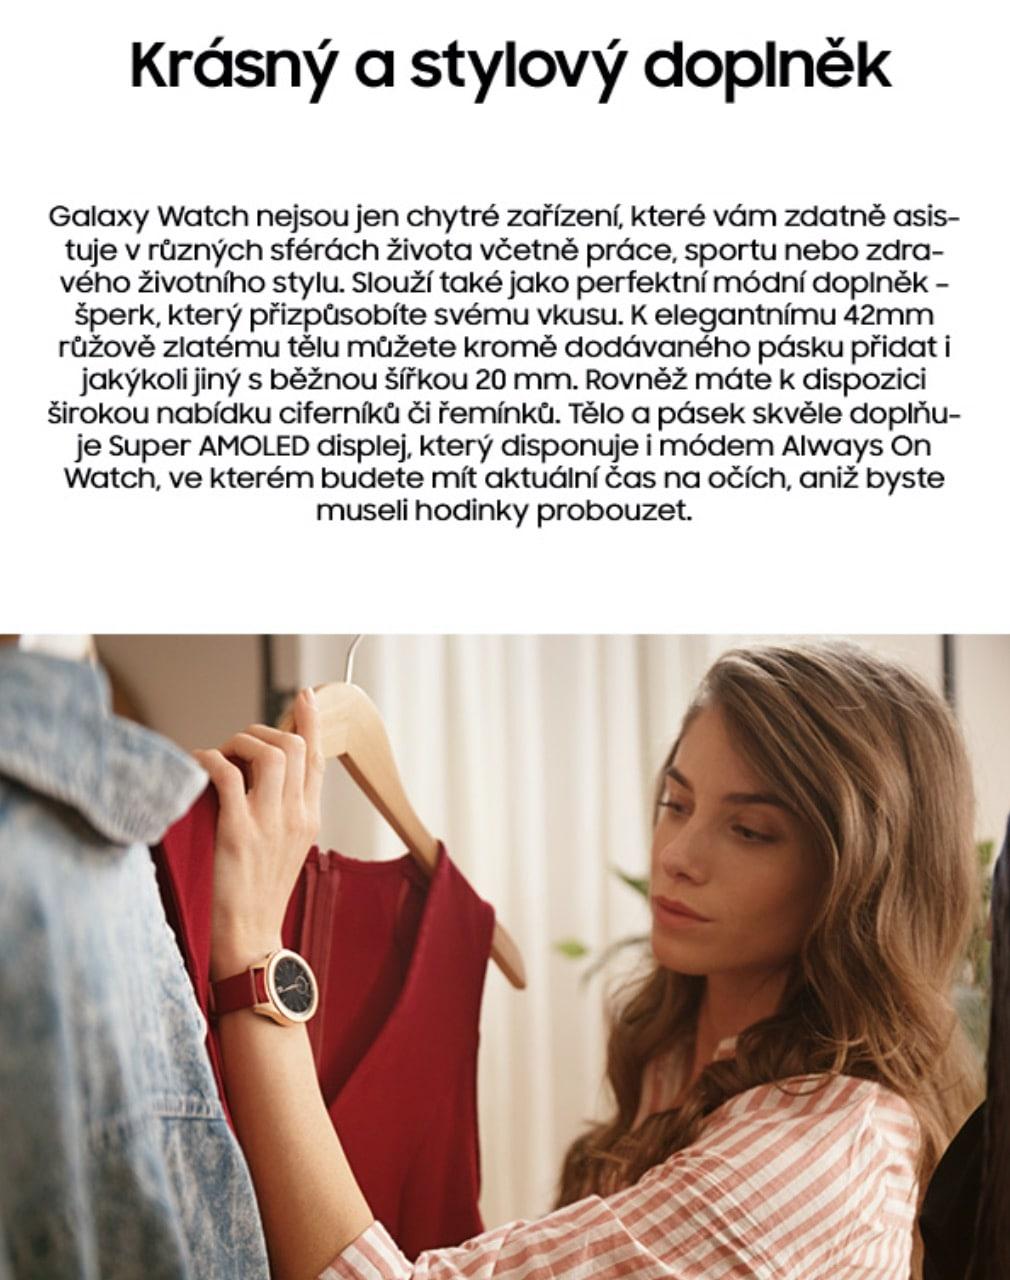 Chytré hodinky Samsung Galaxy Watch 42mm – obě barvy 3-min